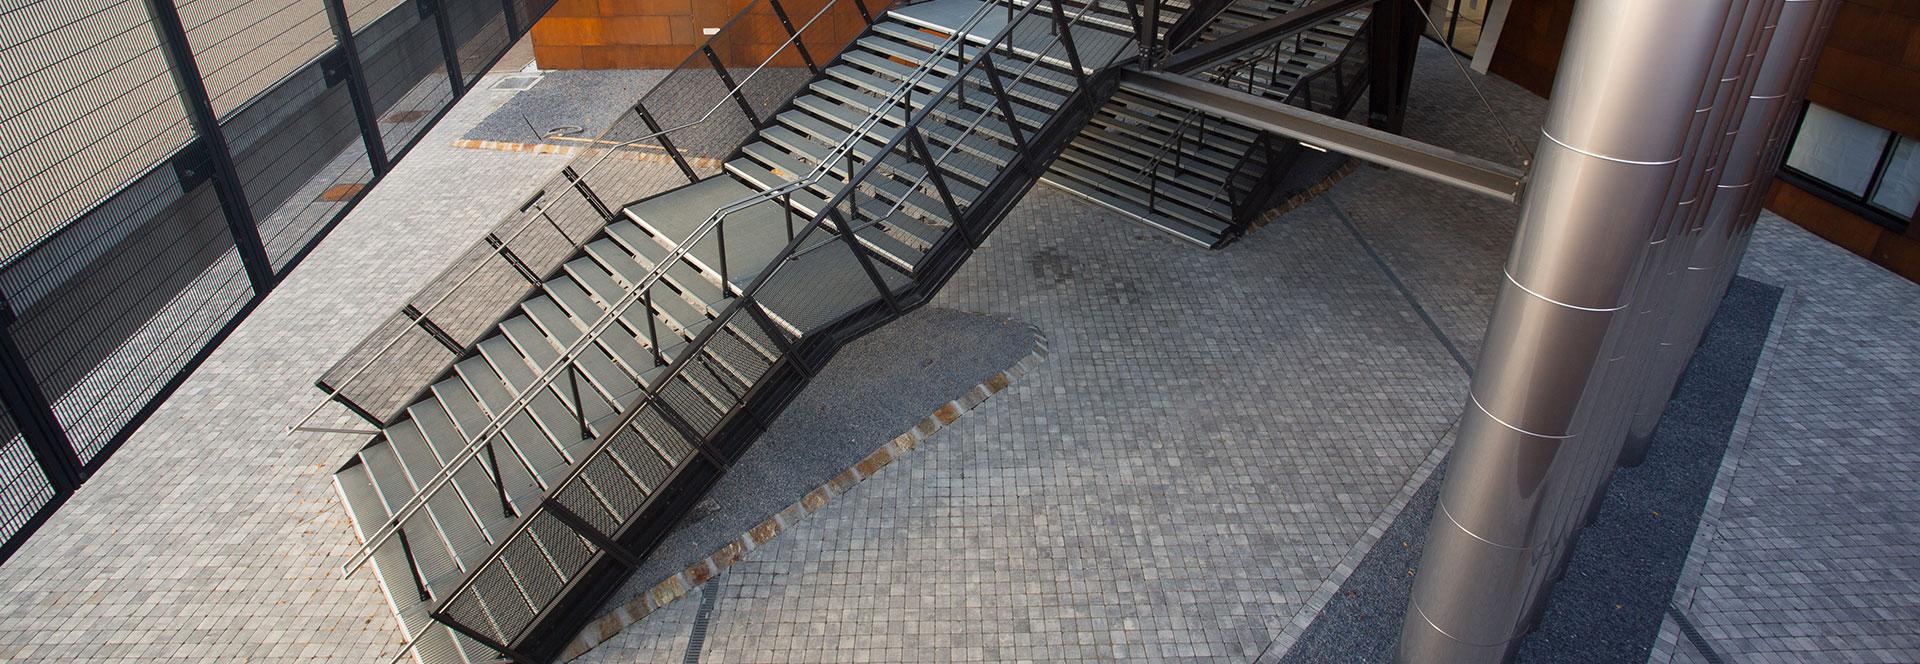 MEA Metal Applications - Referenzen Campus Wien